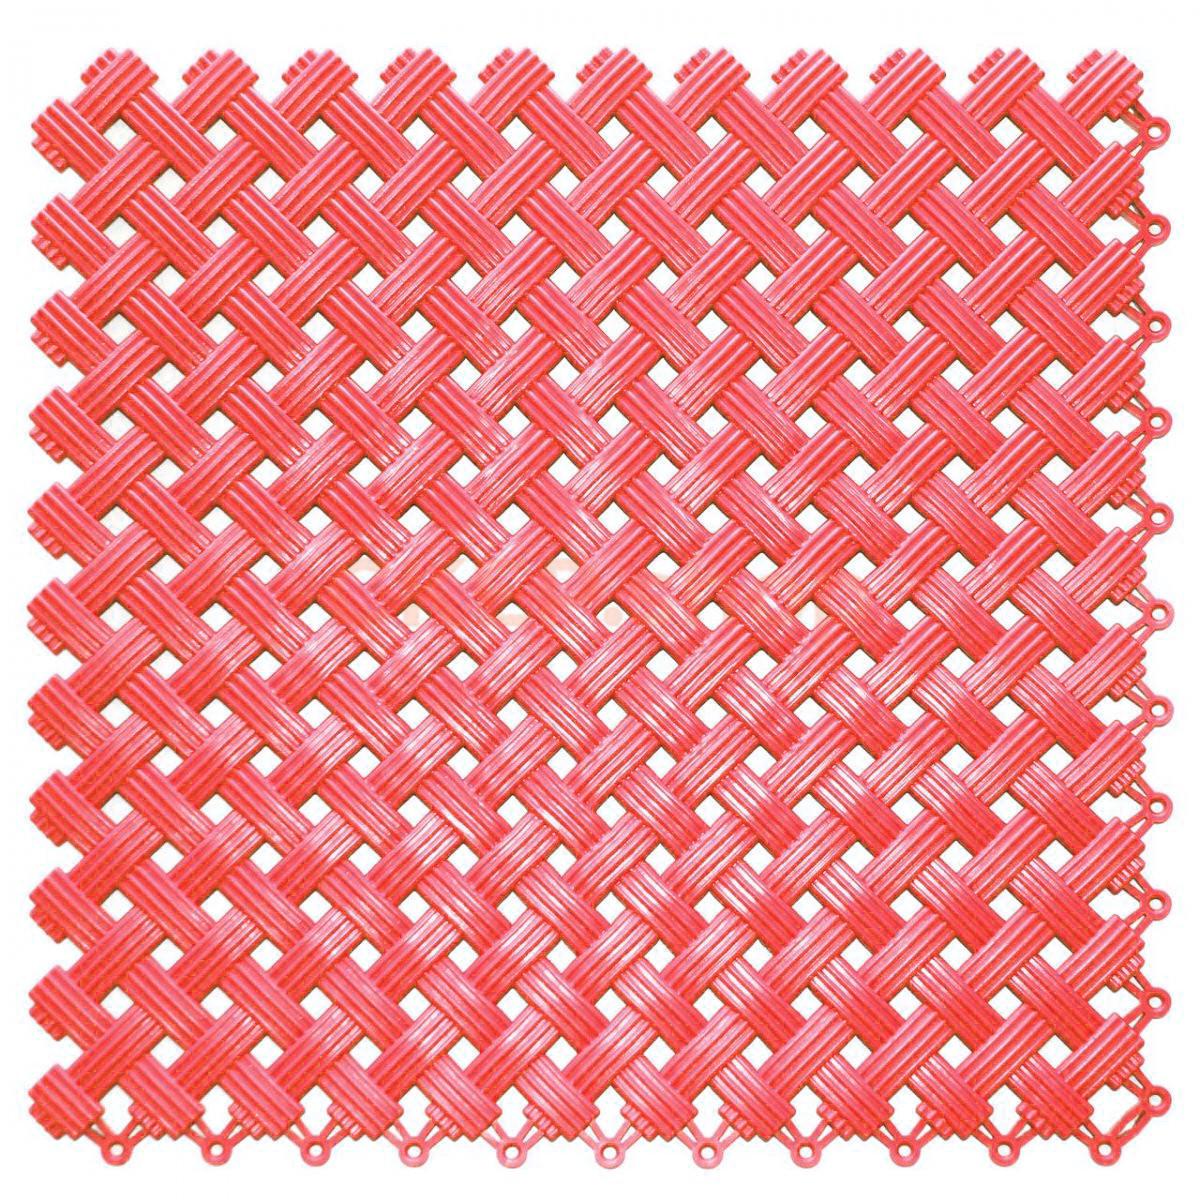 Покрытие модульное Аква, 200х200х8,5 мм, красное